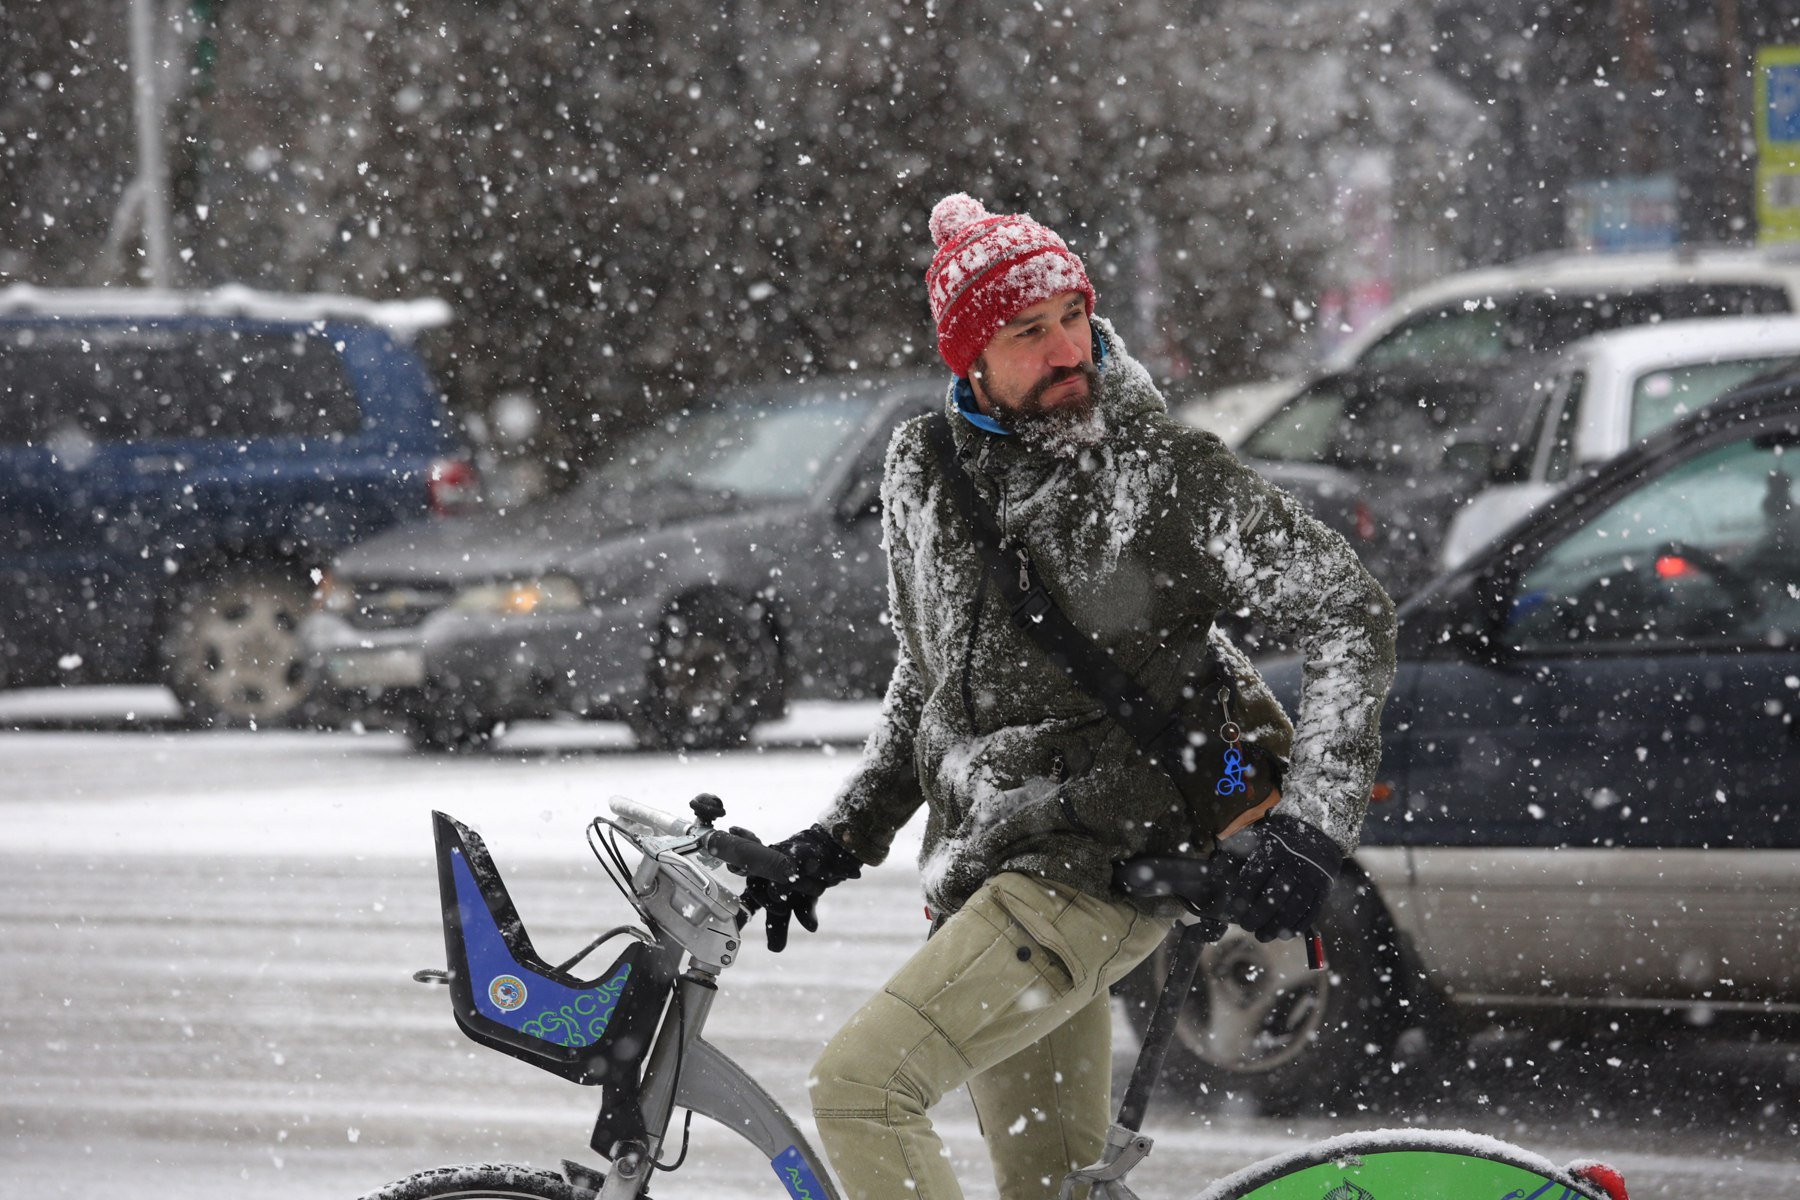 Александр Габченко на велосипеде Алматы Bike, зимой на велосипеде, Александр Габченко